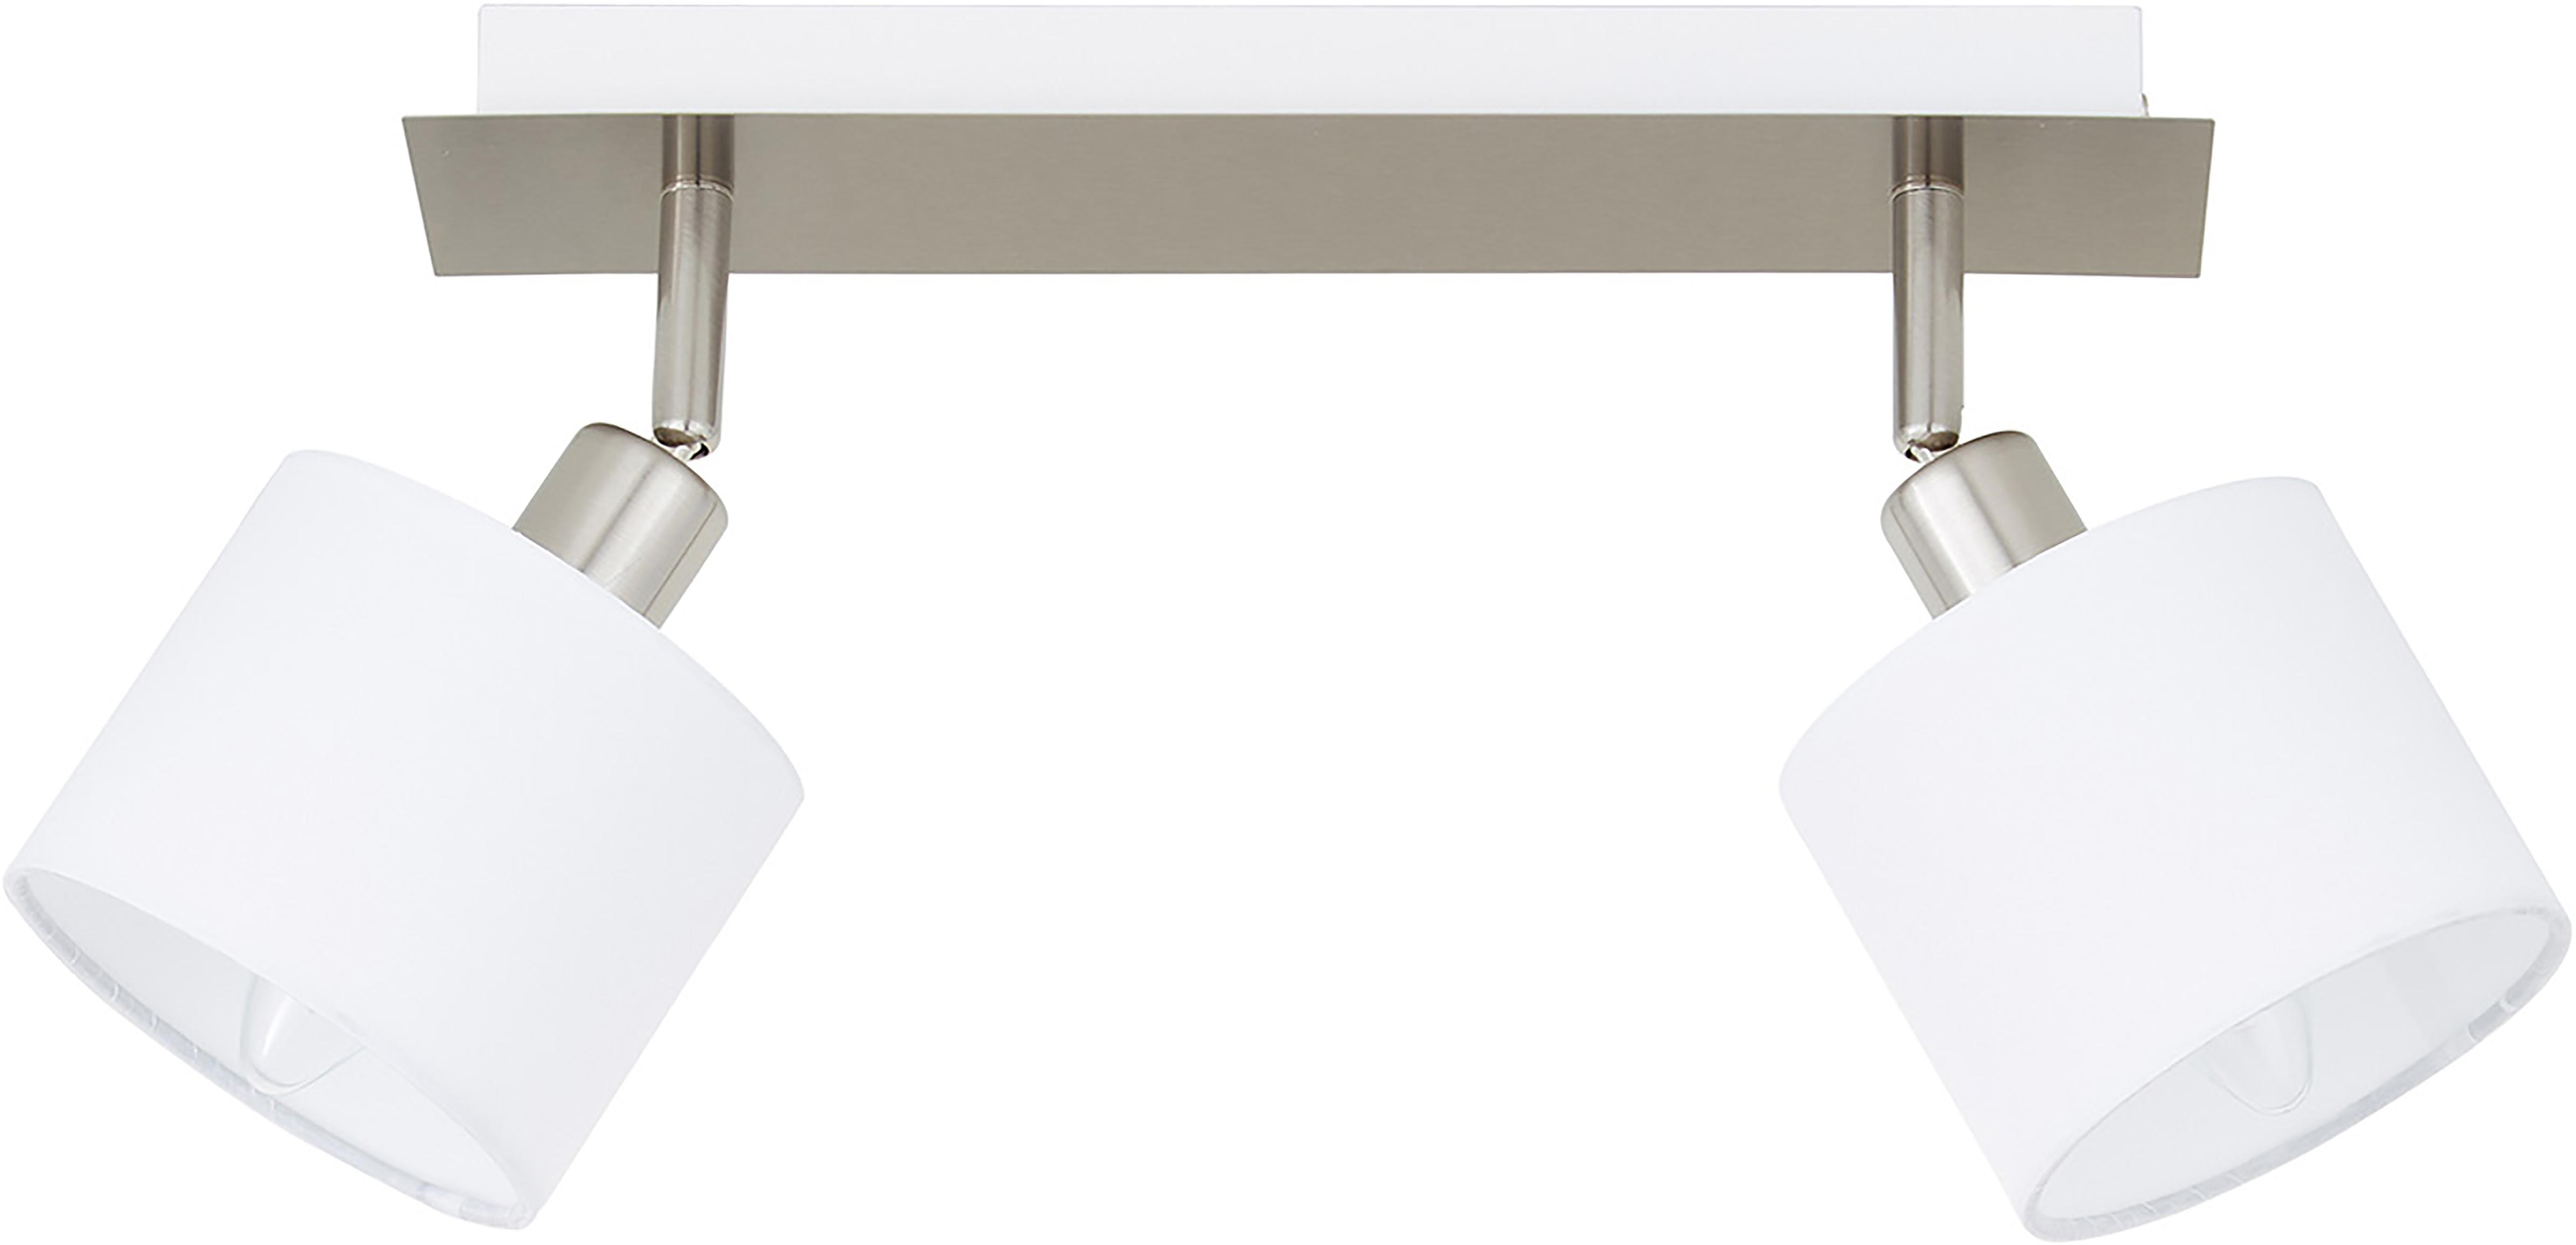 Deckenstrahler Casper, Baldachin: Metall, vernickelt, Silberfarben,Weiss, 32 x 7 cm